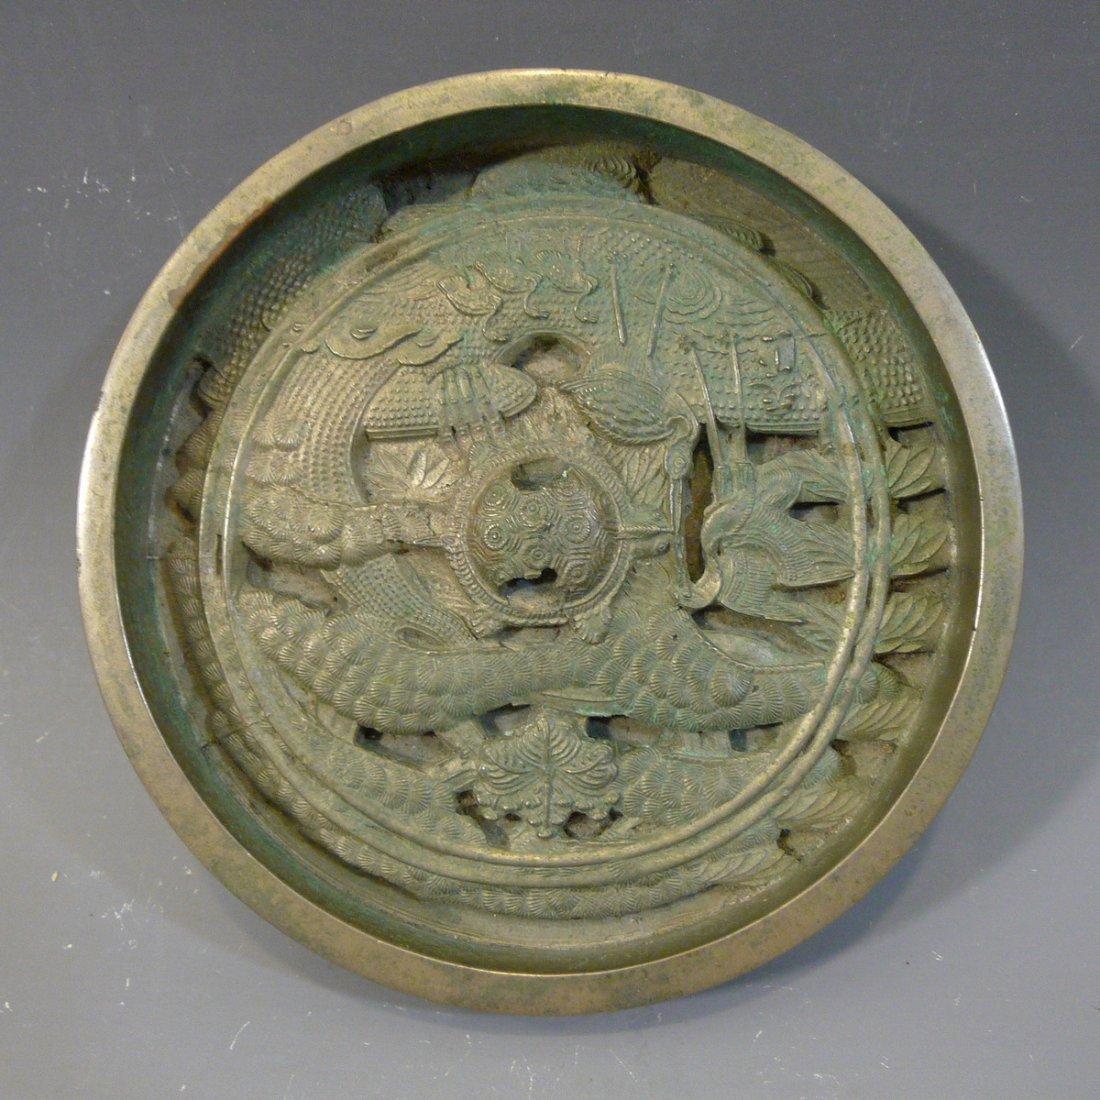 ANTIQUE JAPANESE BRONZE MIRROR - 18TH CENTURY